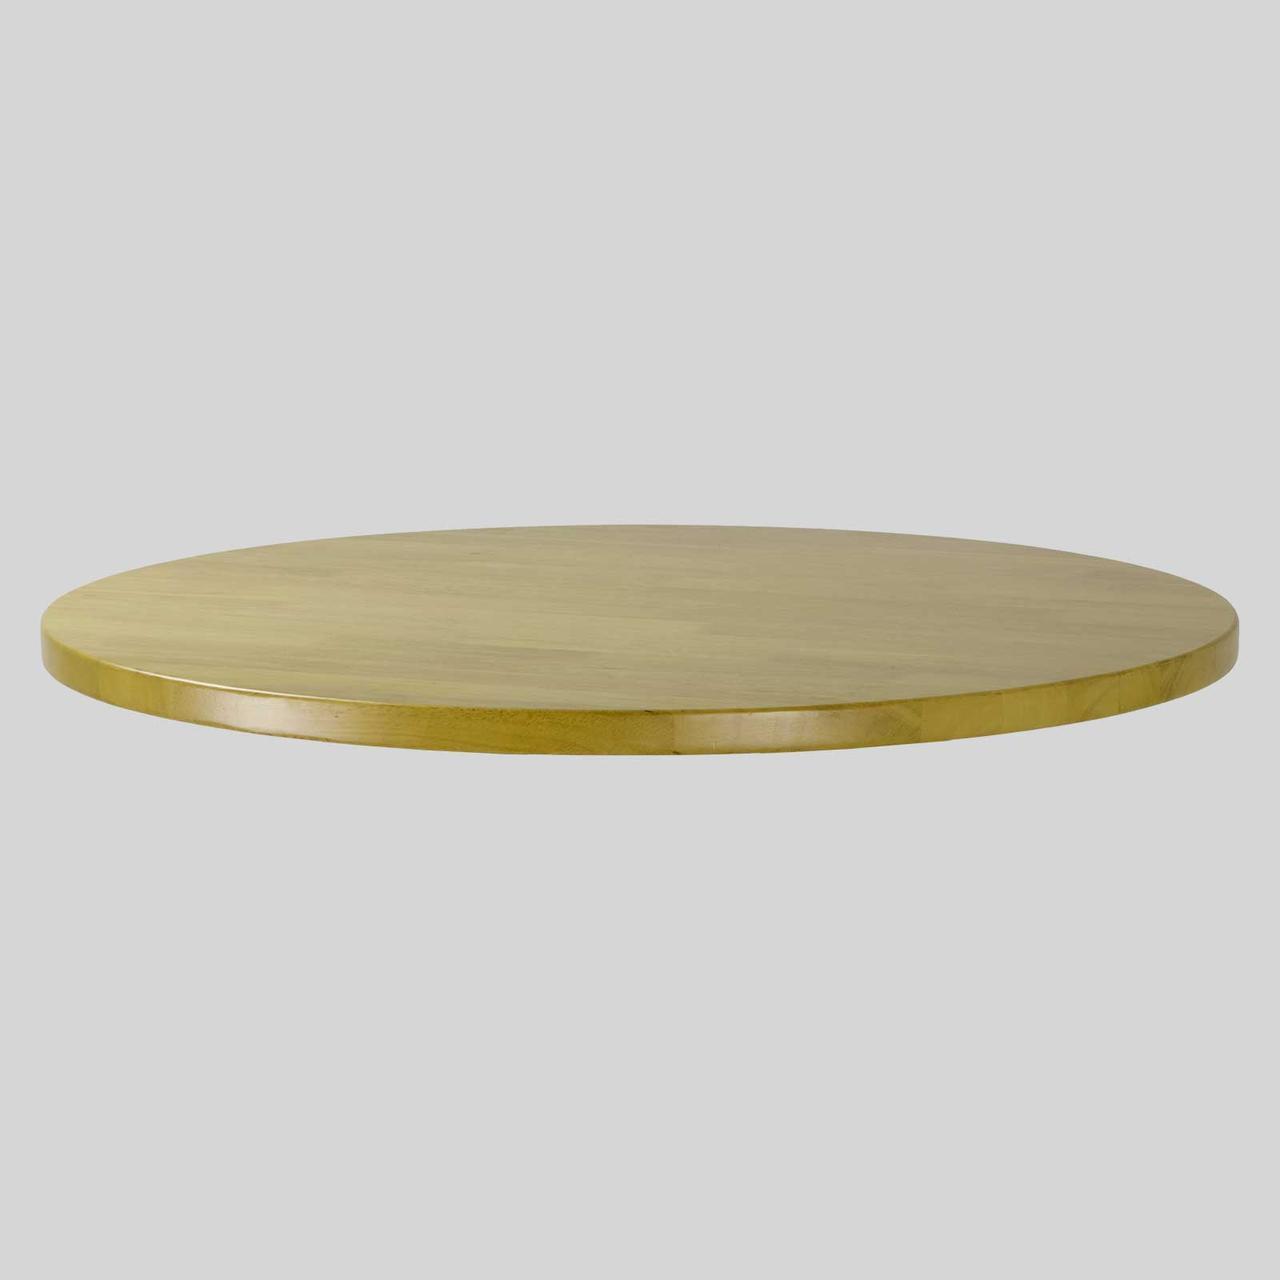 round_table_top_light_oak_f_1.jpg